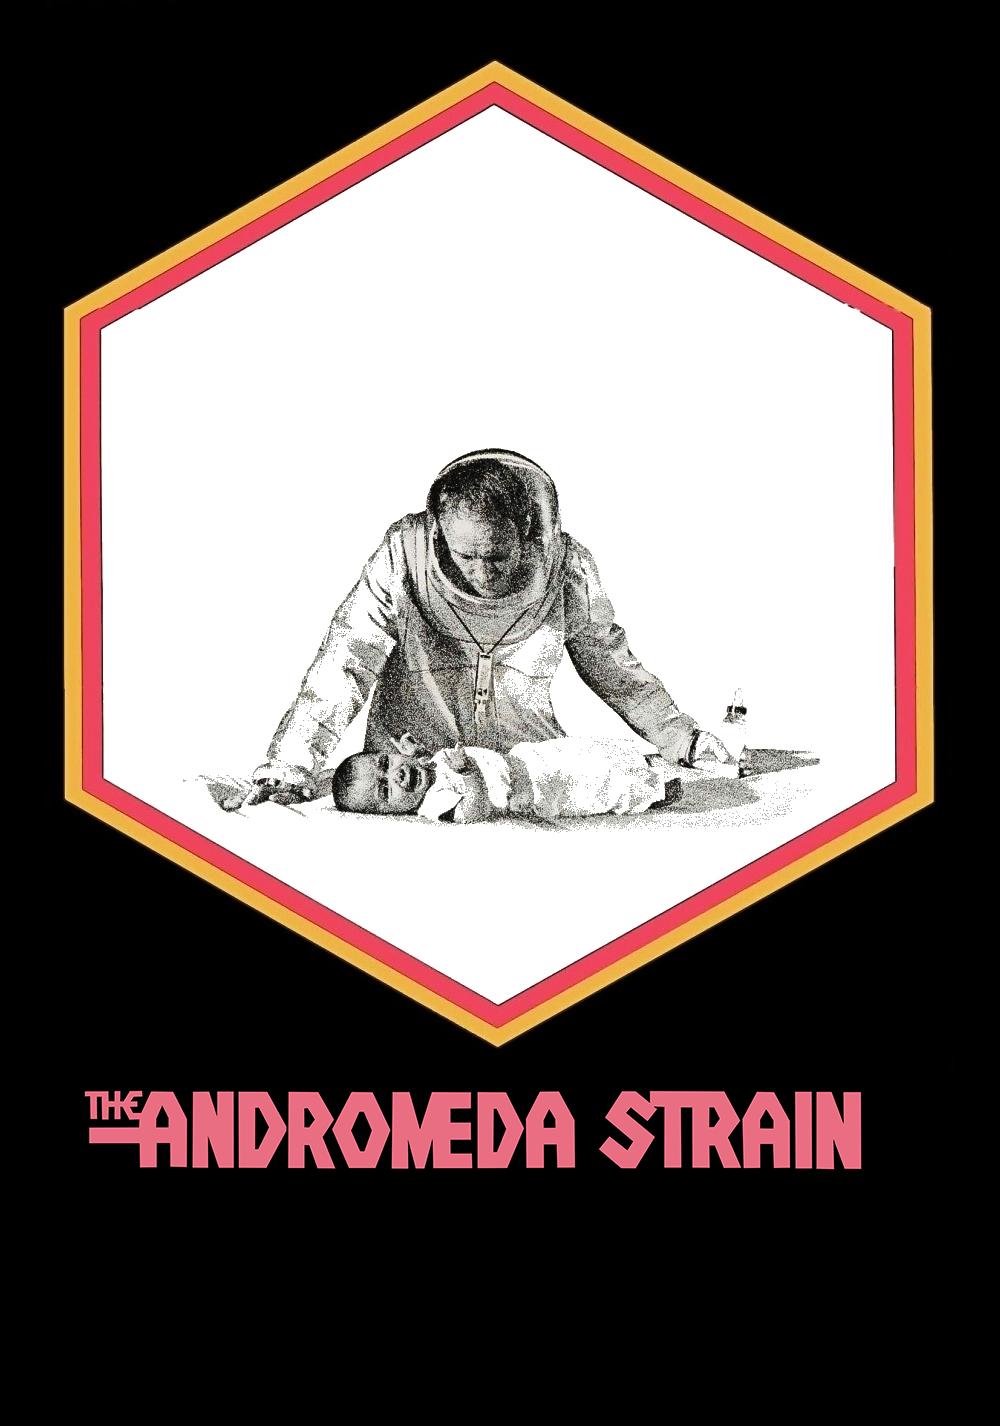 The Andromeda Strain (film)